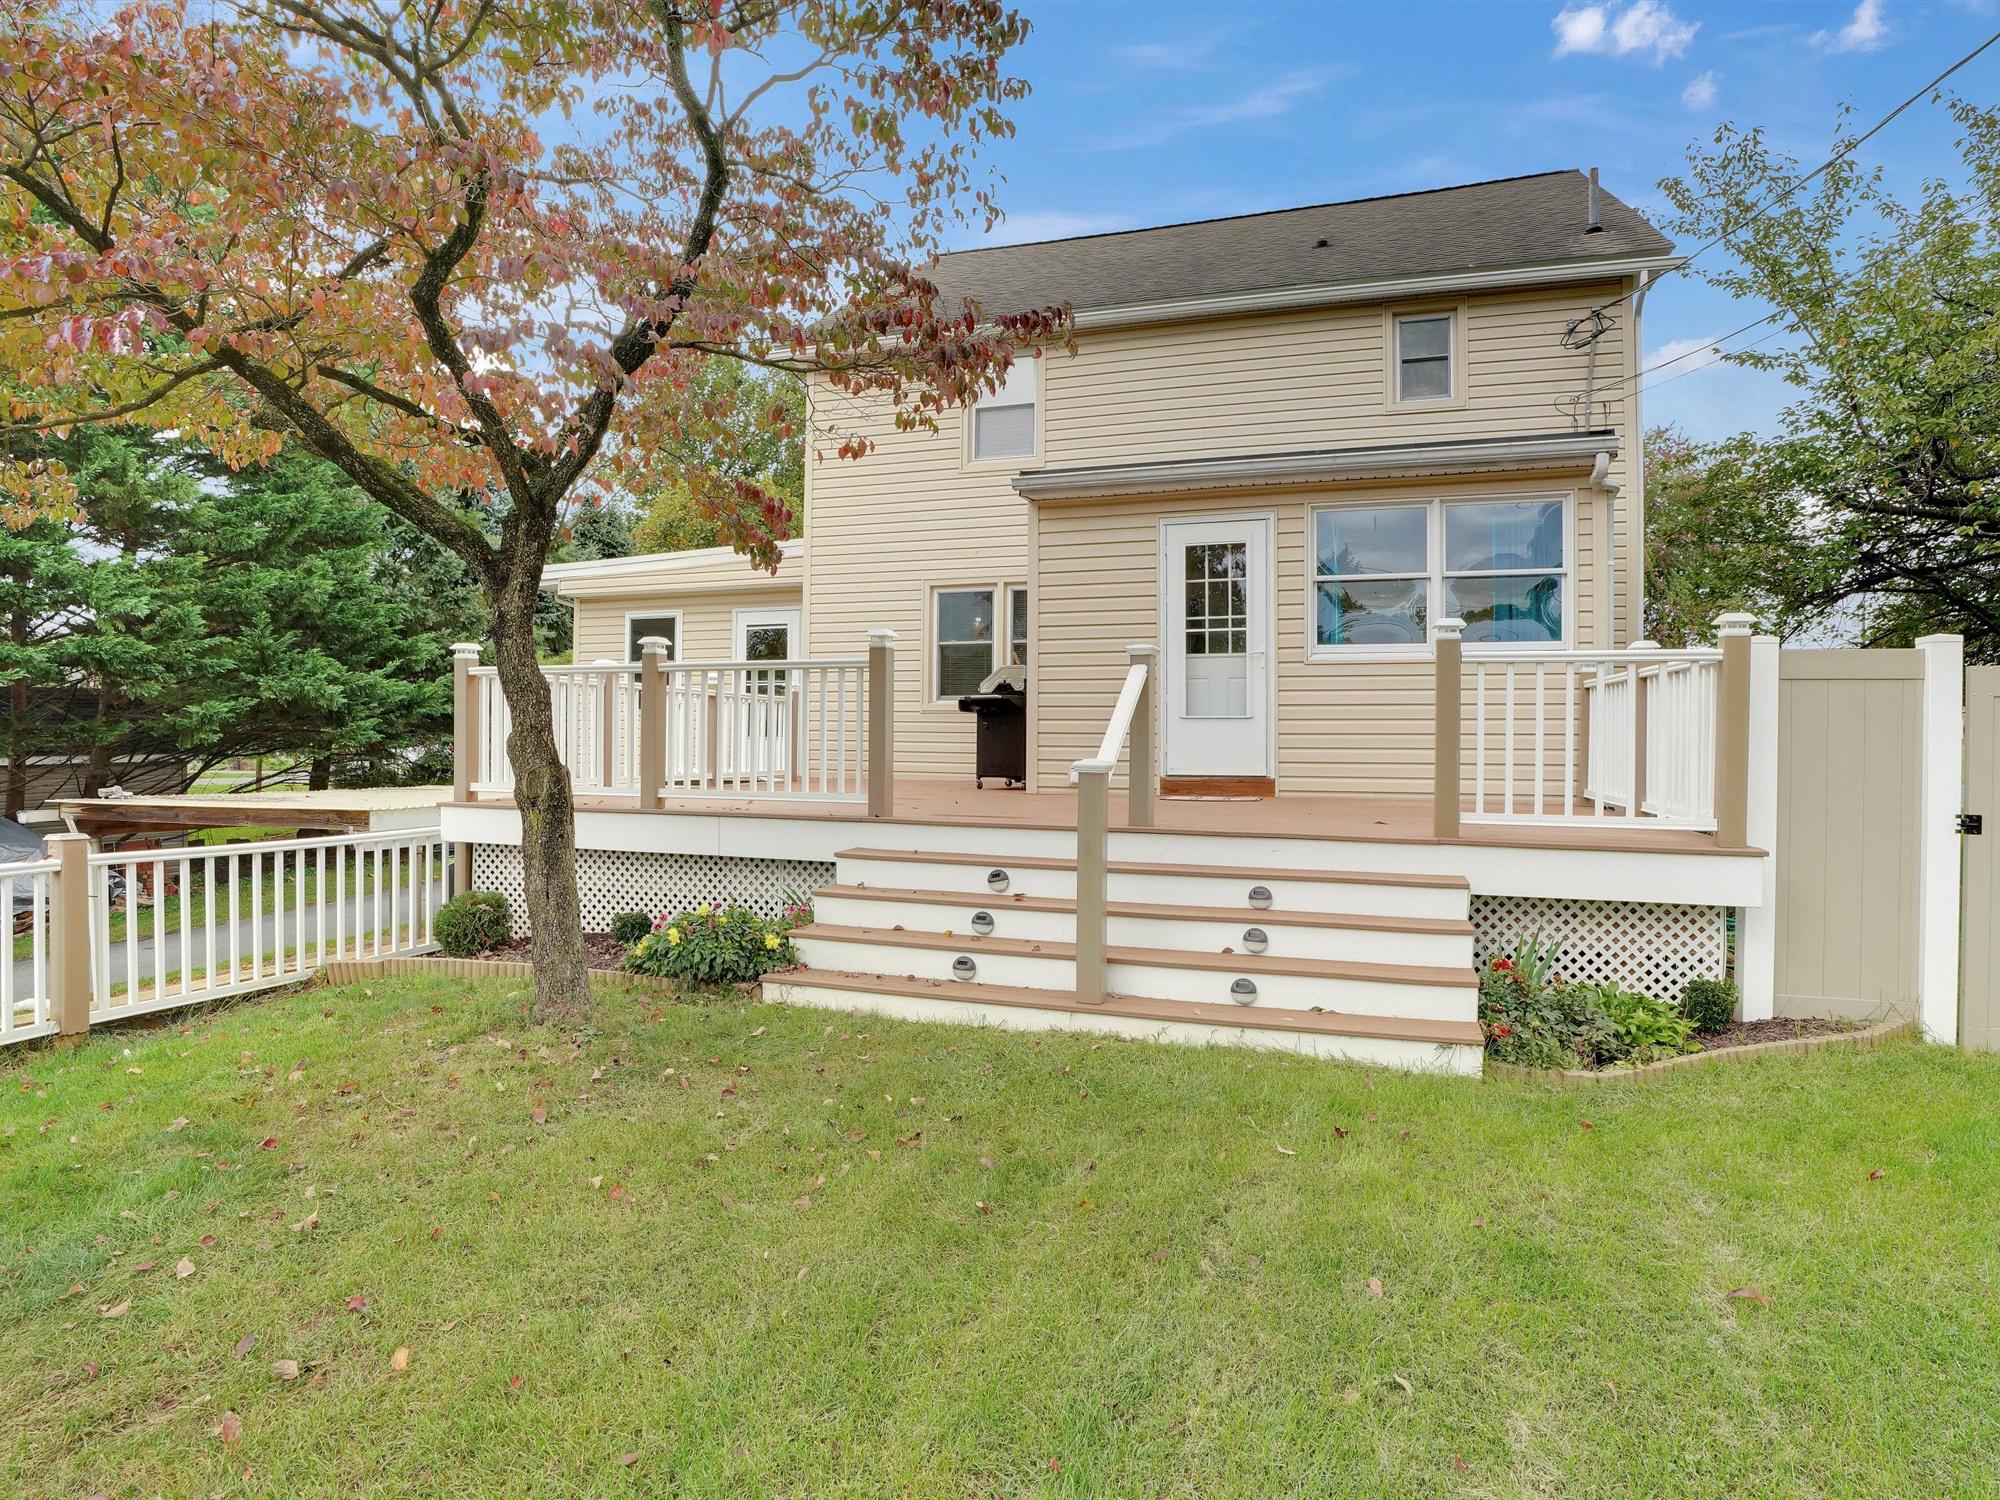 2022 Kline St - Back of Charming Single Family home